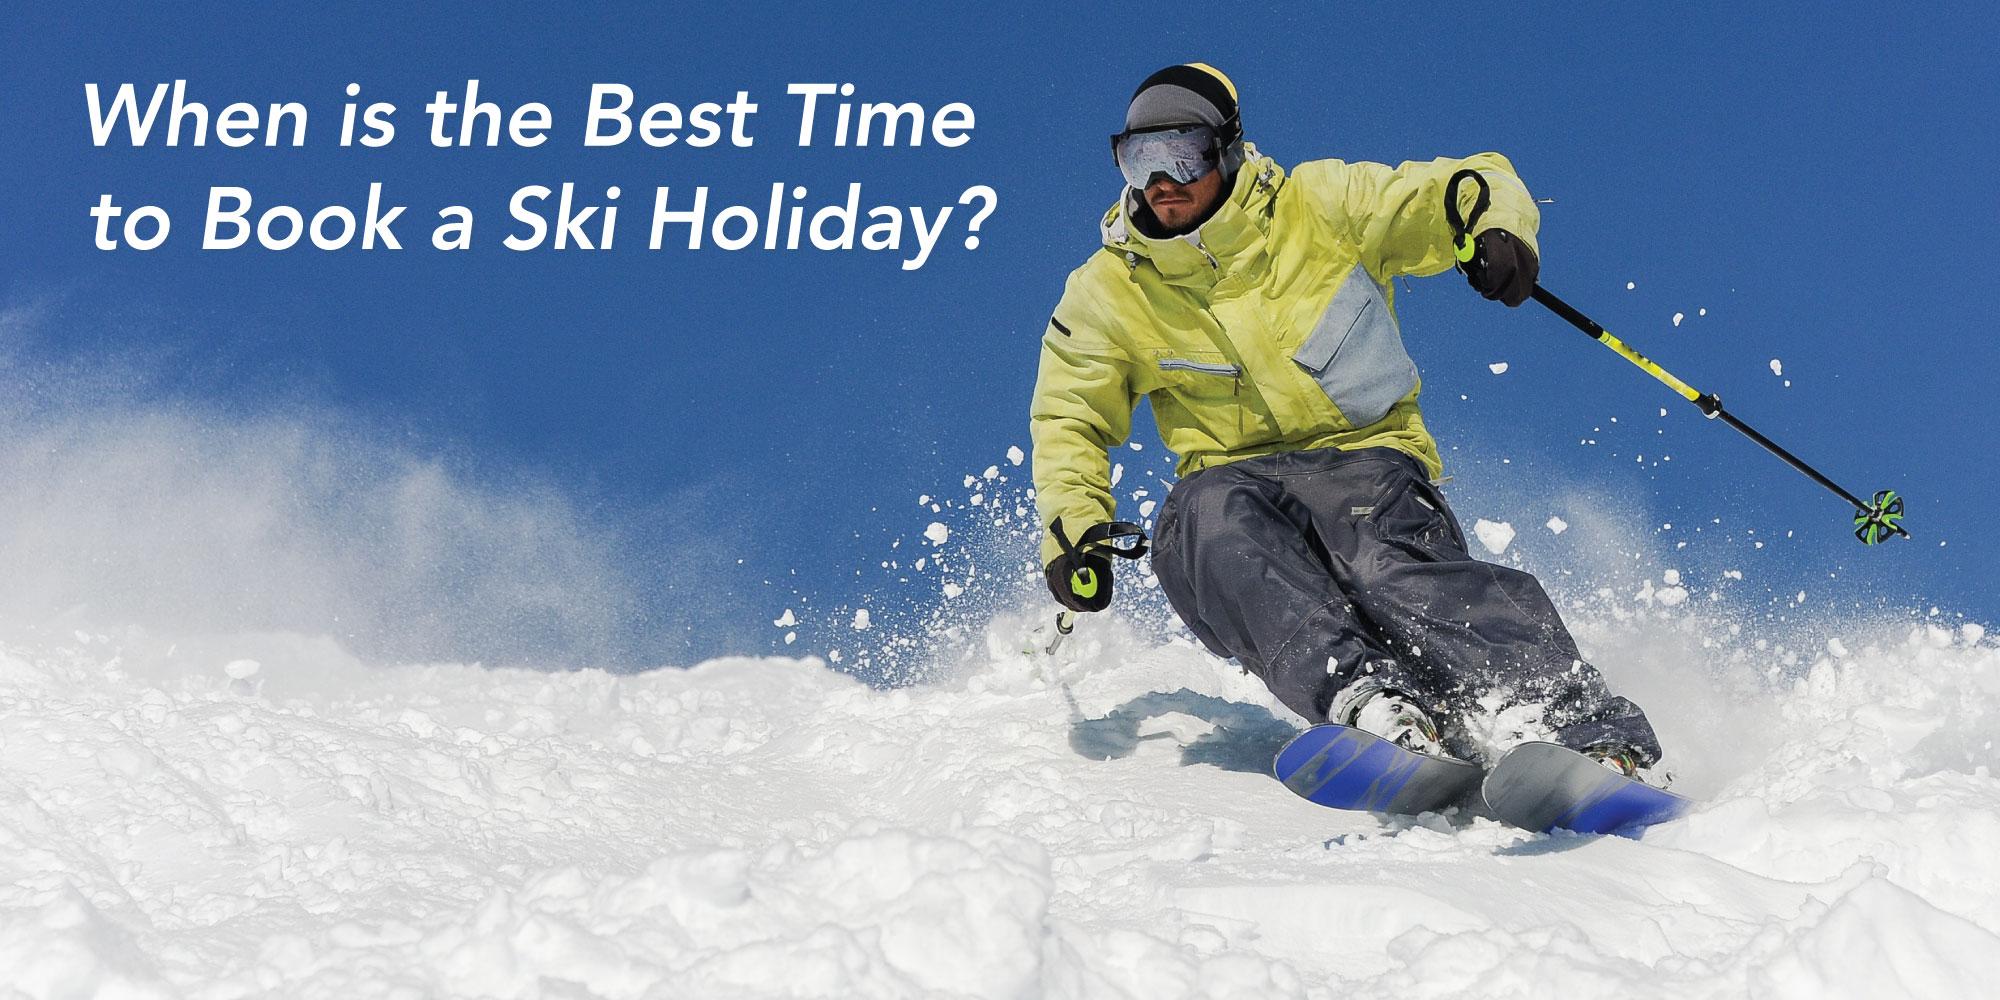 Skier going through thick snow